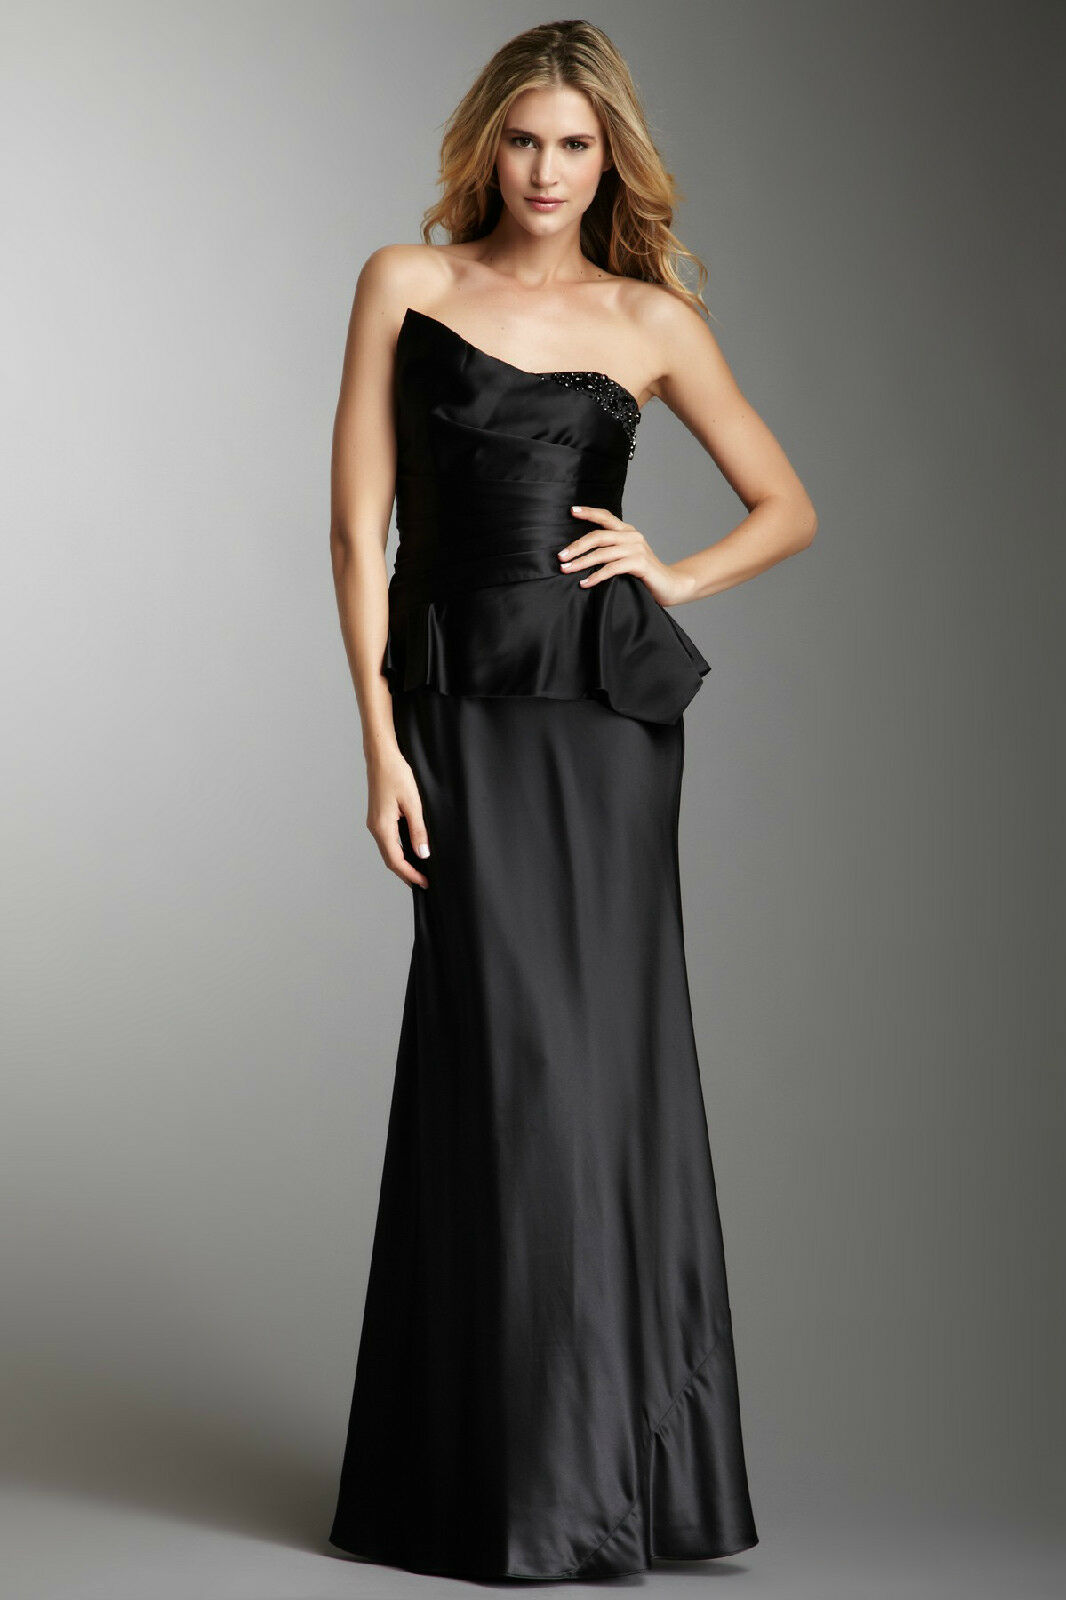 Laundry by Shelli Segal schwarz Strapless Formal Gown Dress Größe 2 NWT